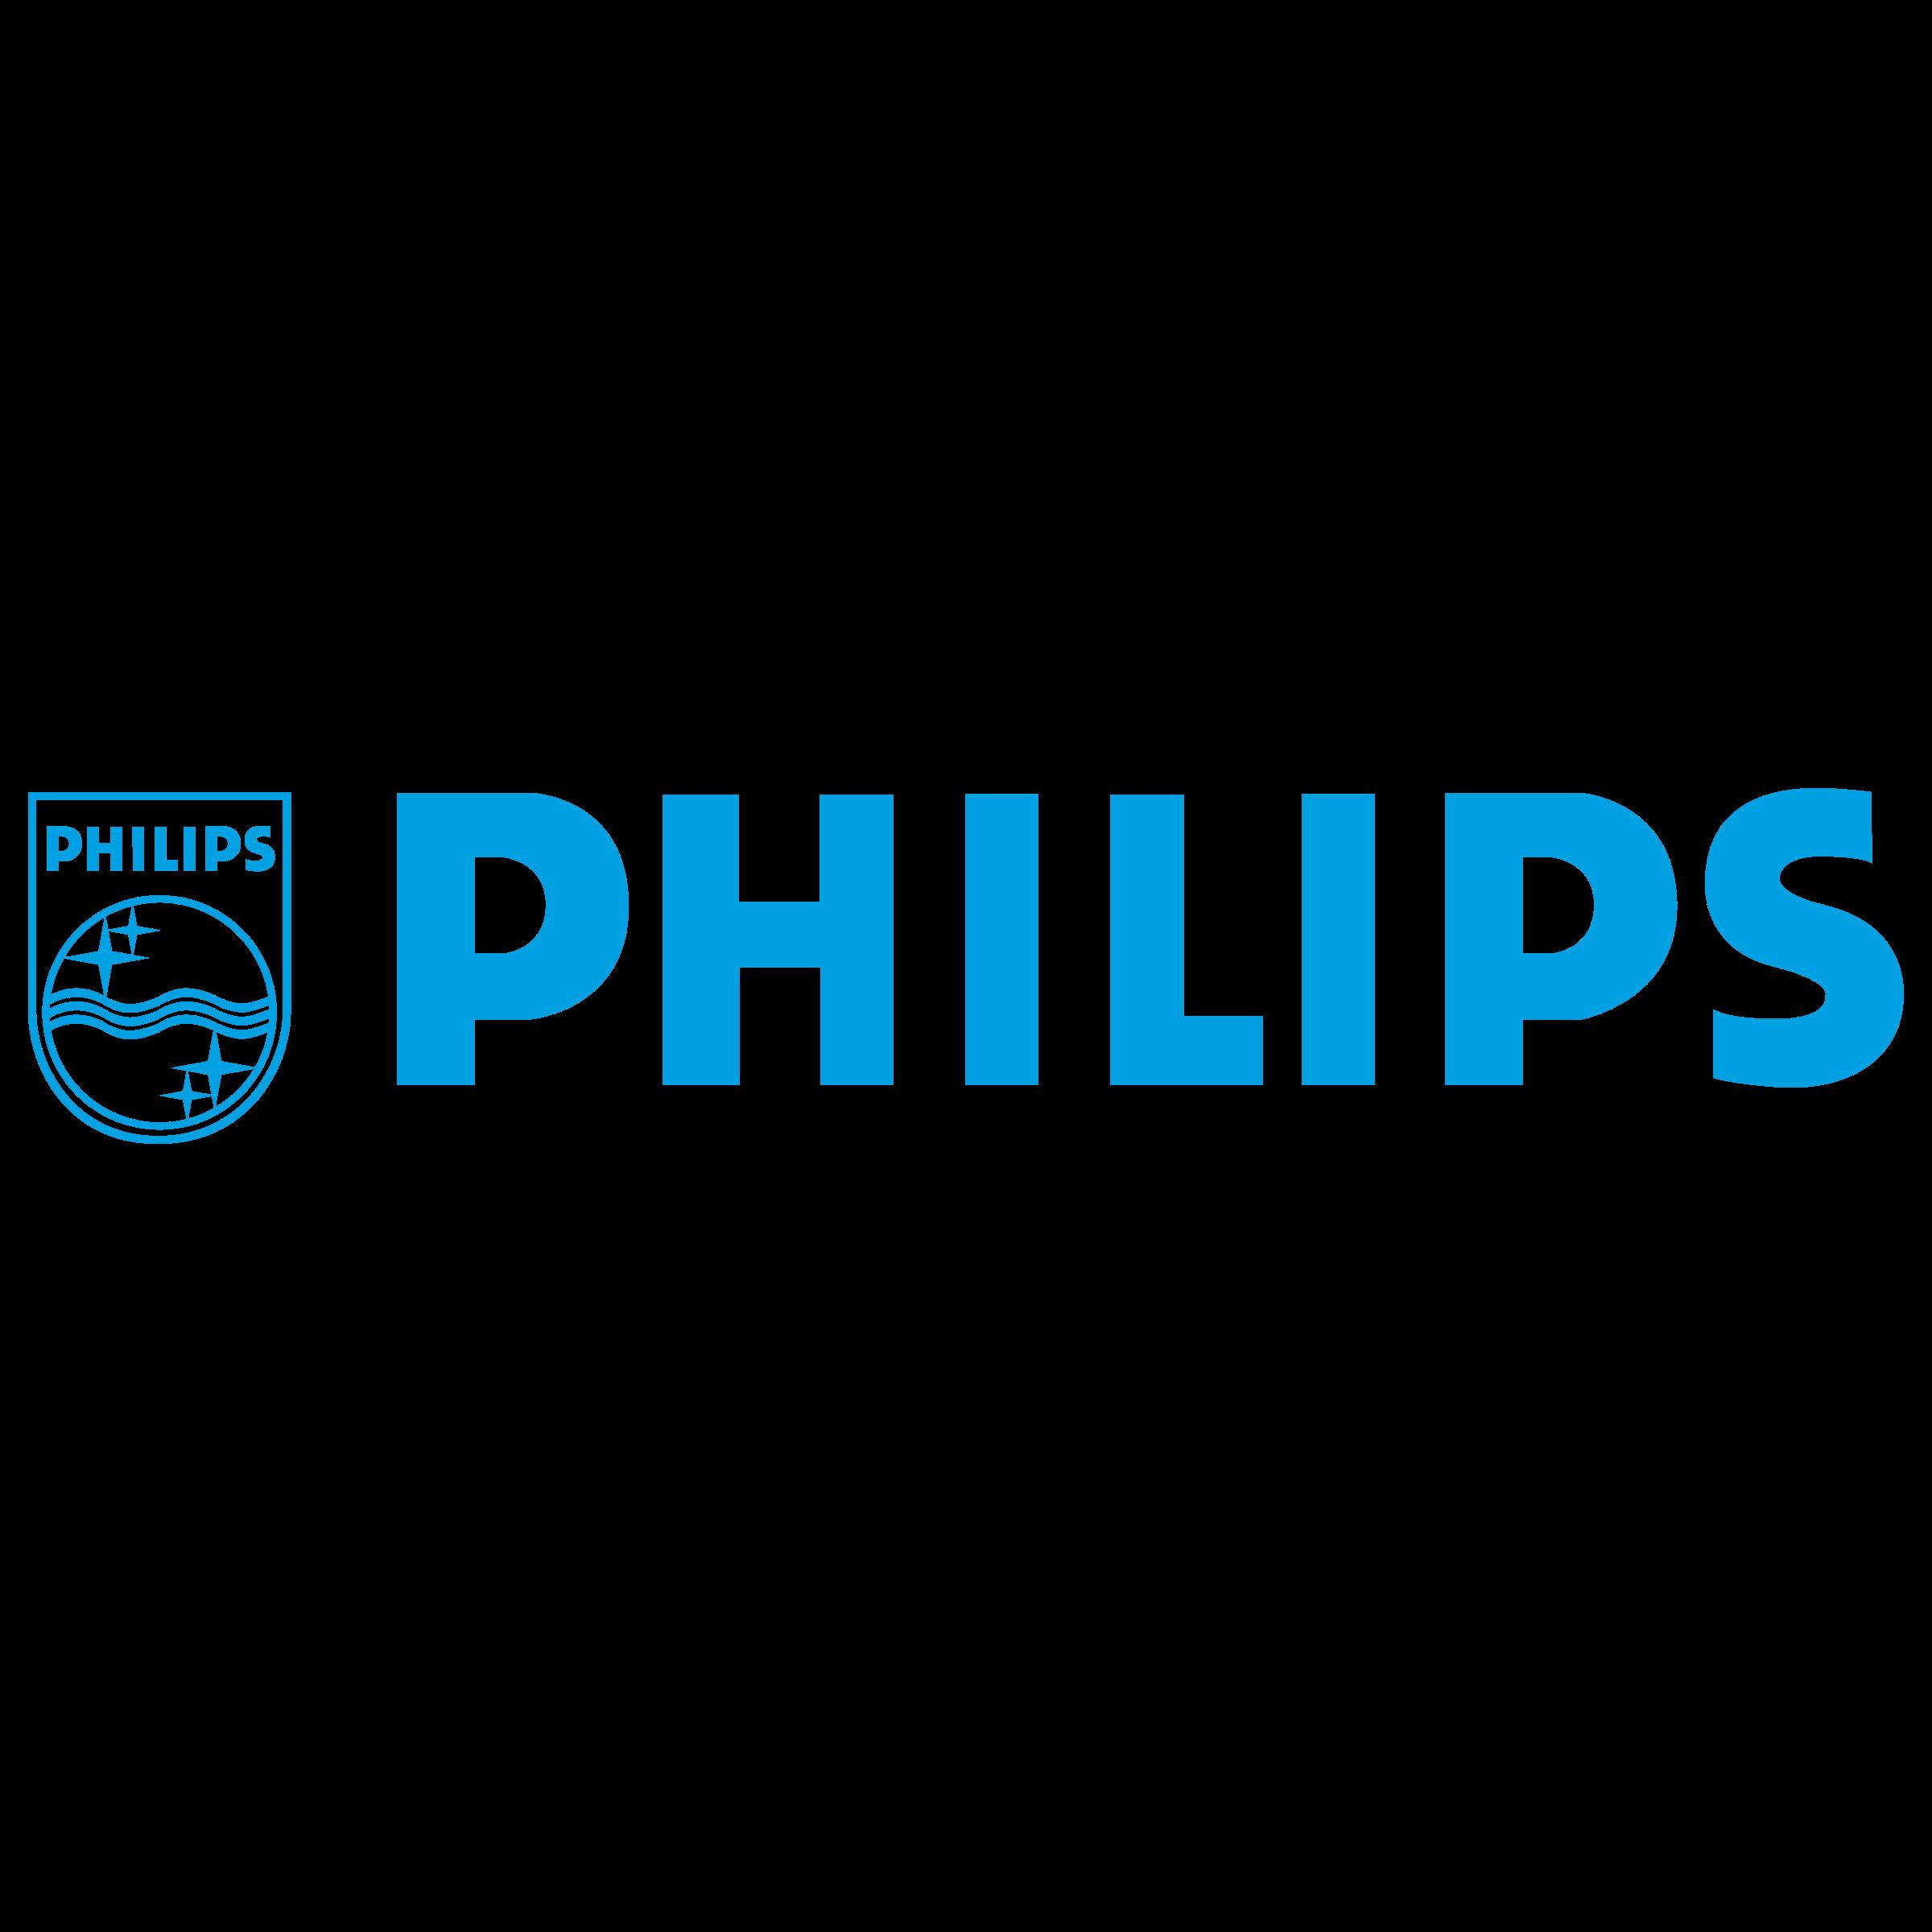 philips-2-logo-png-transparent.png